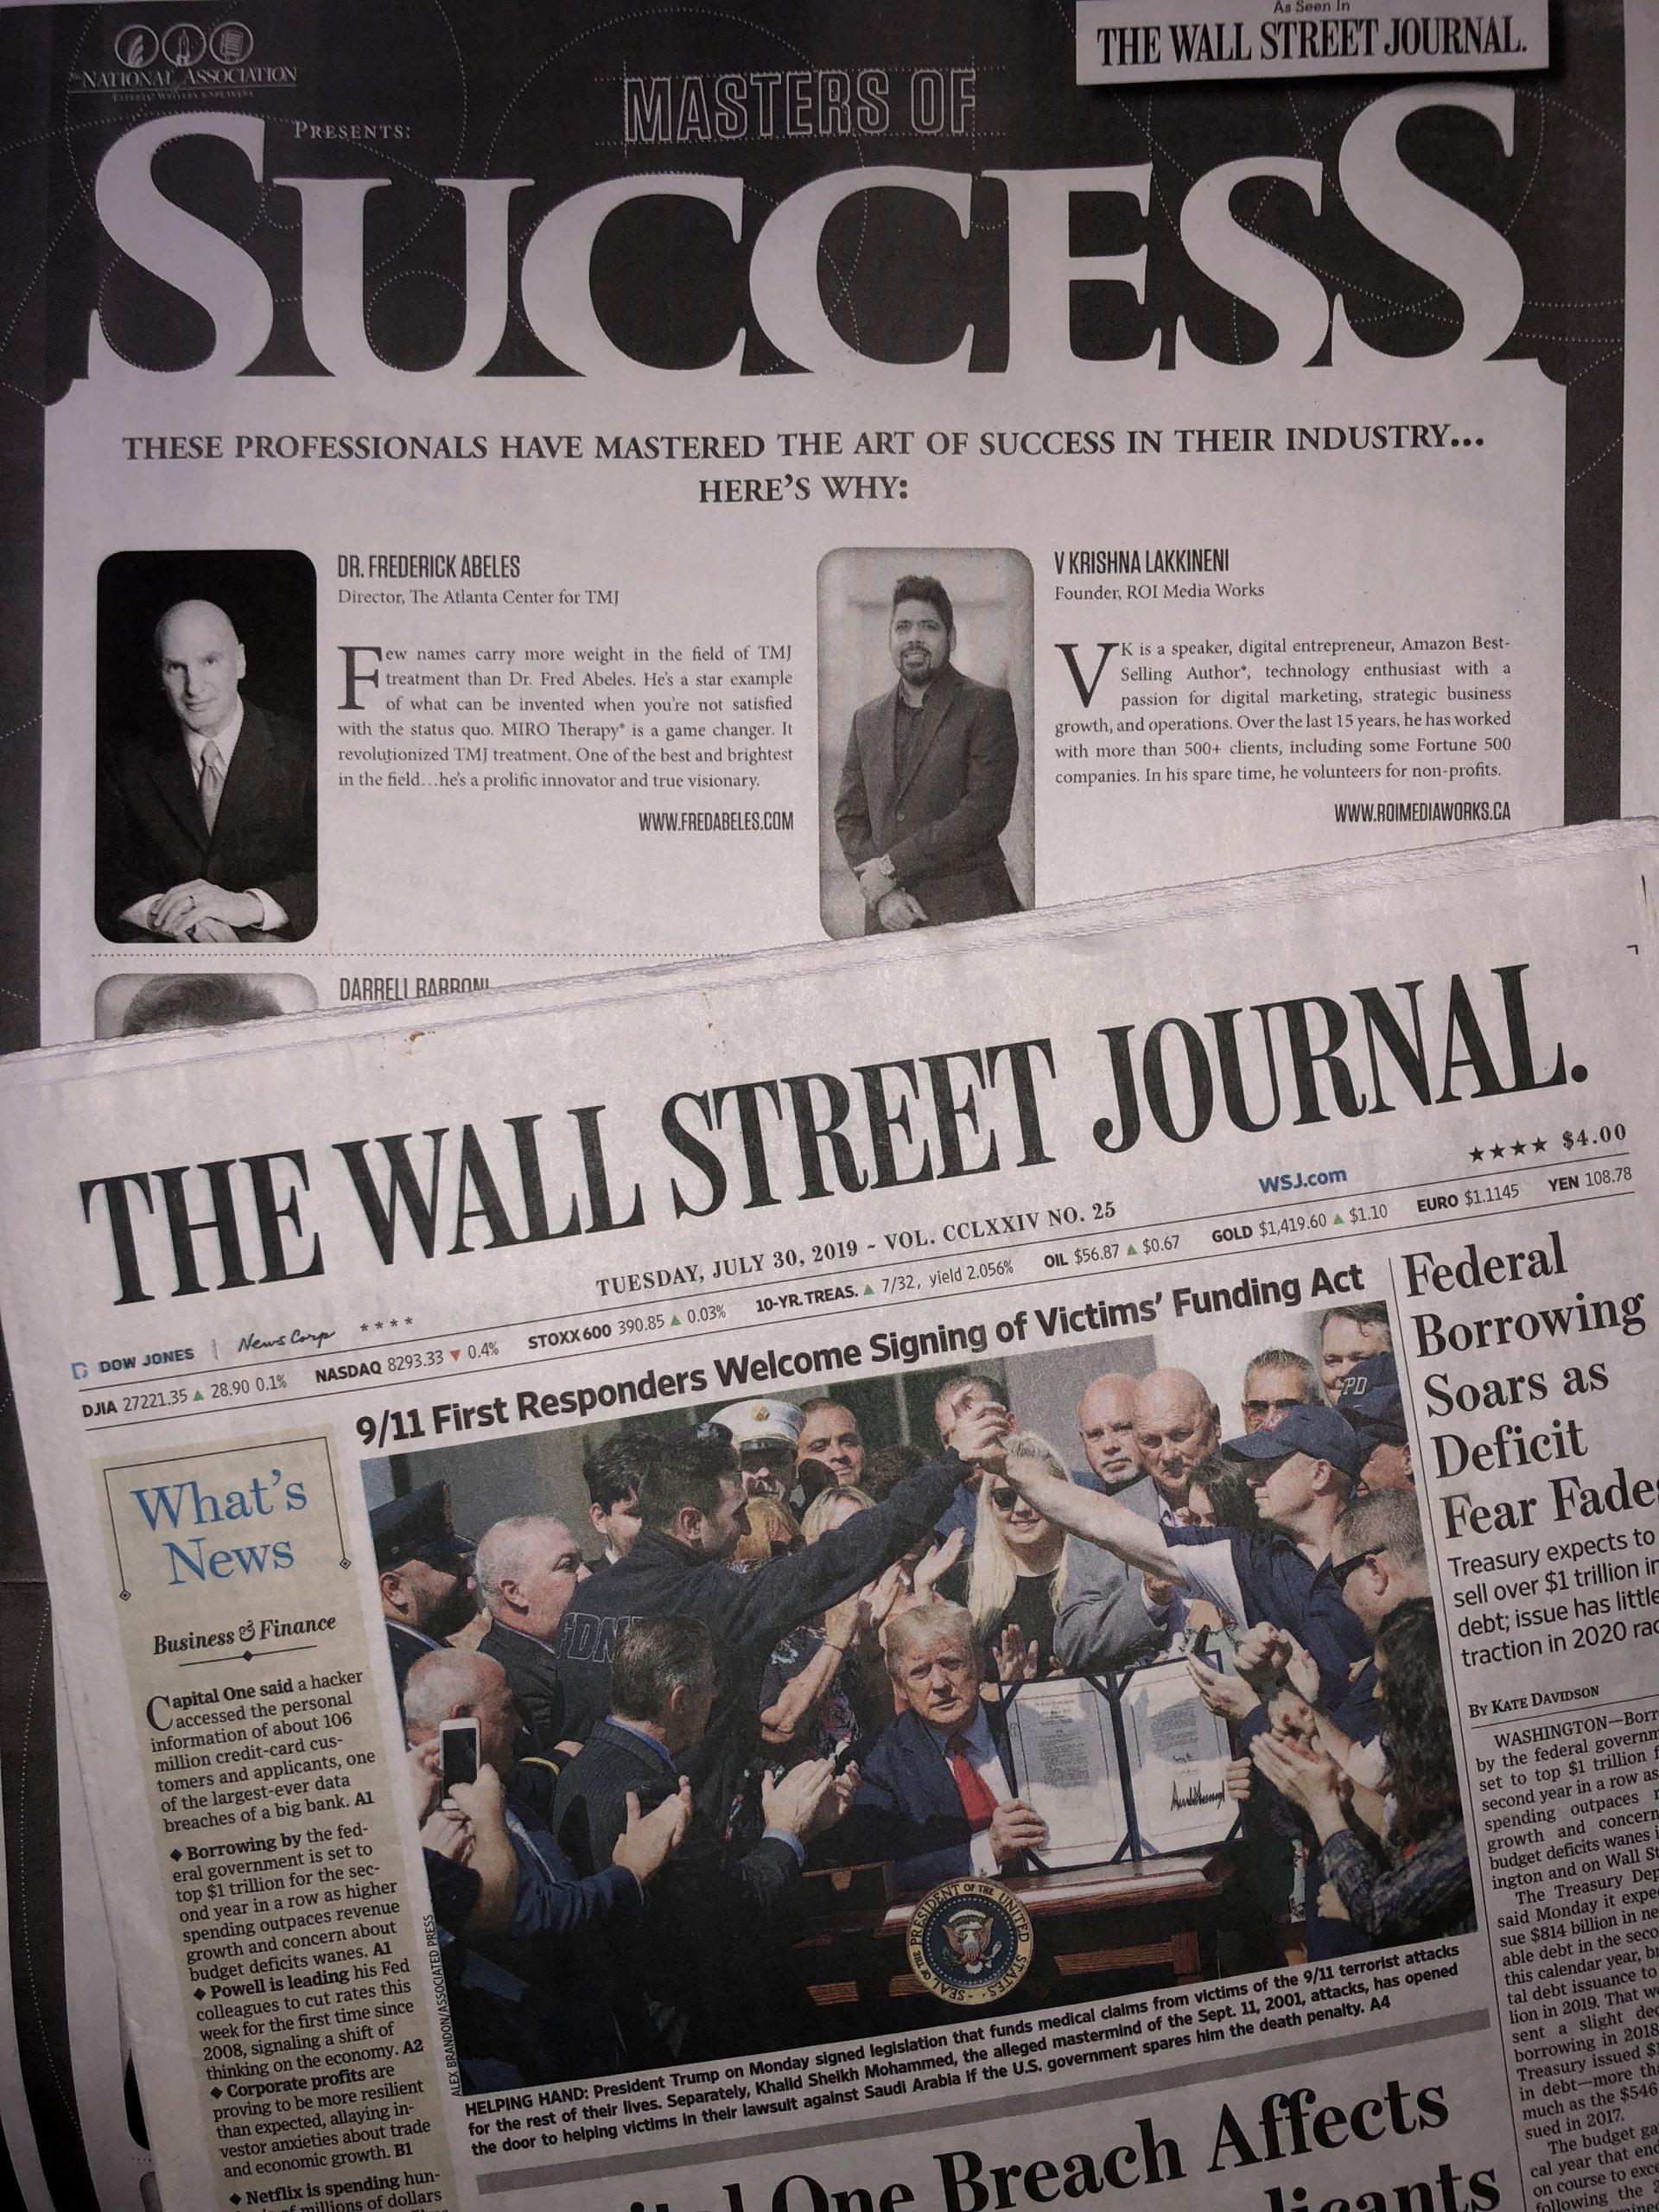 V Krishna Lakkineni Wall Street Journal